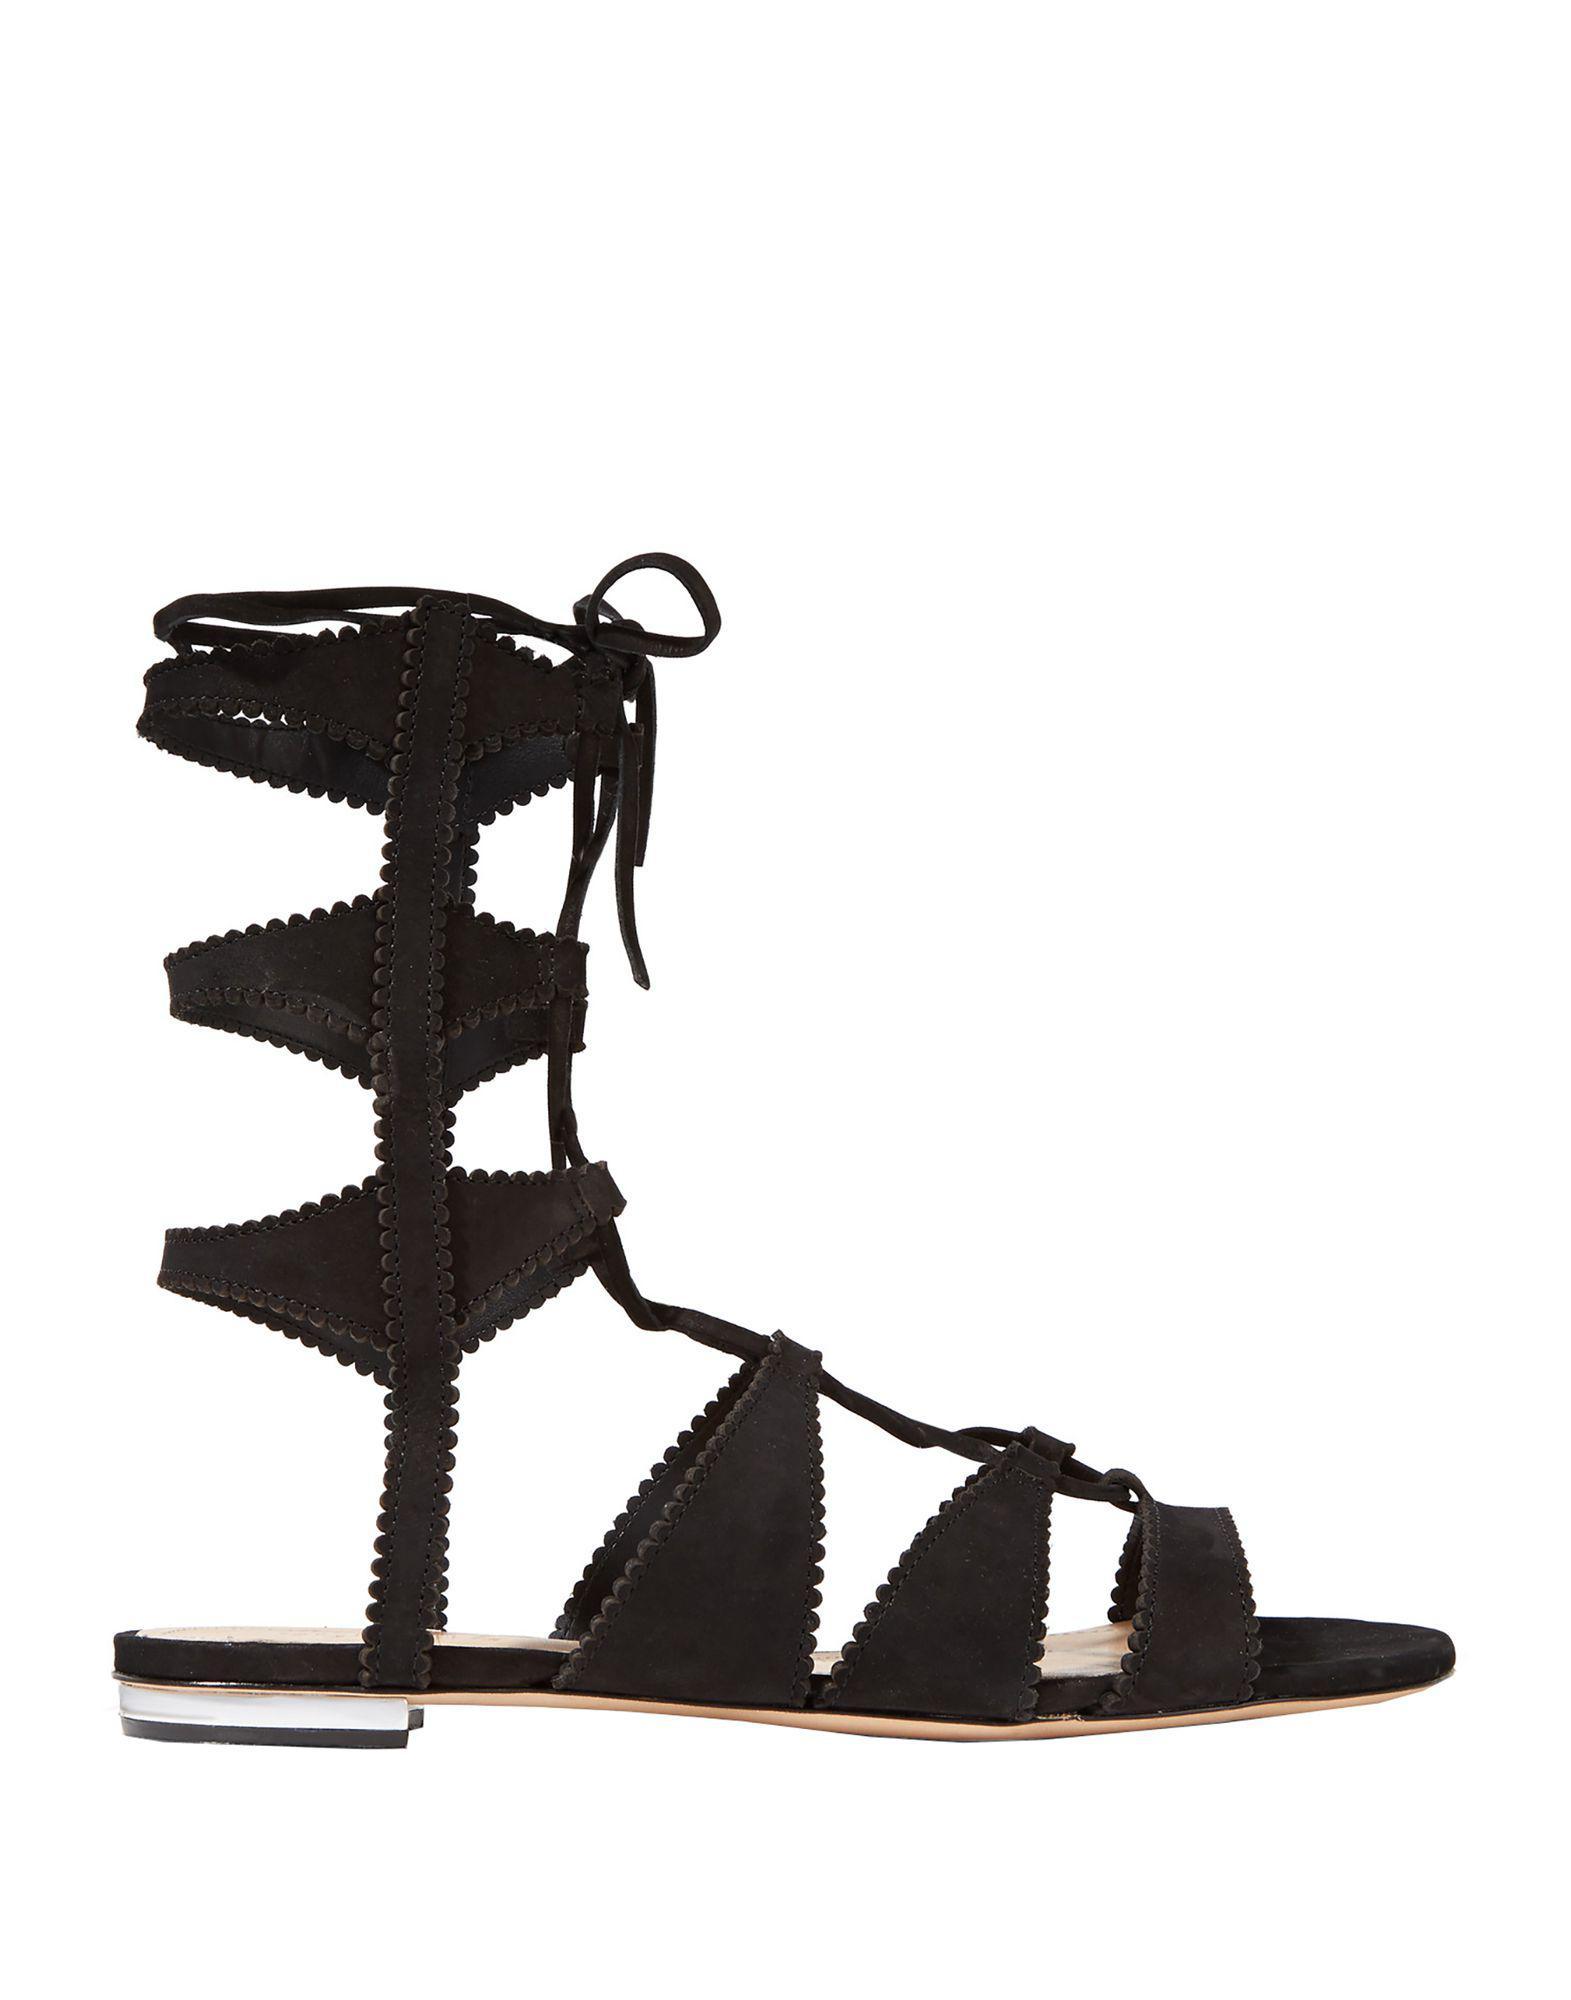 bc03cd0394ac Schutz - Metallic Erlina Suede Gladiator Sandals - Lyst. View fullscreen